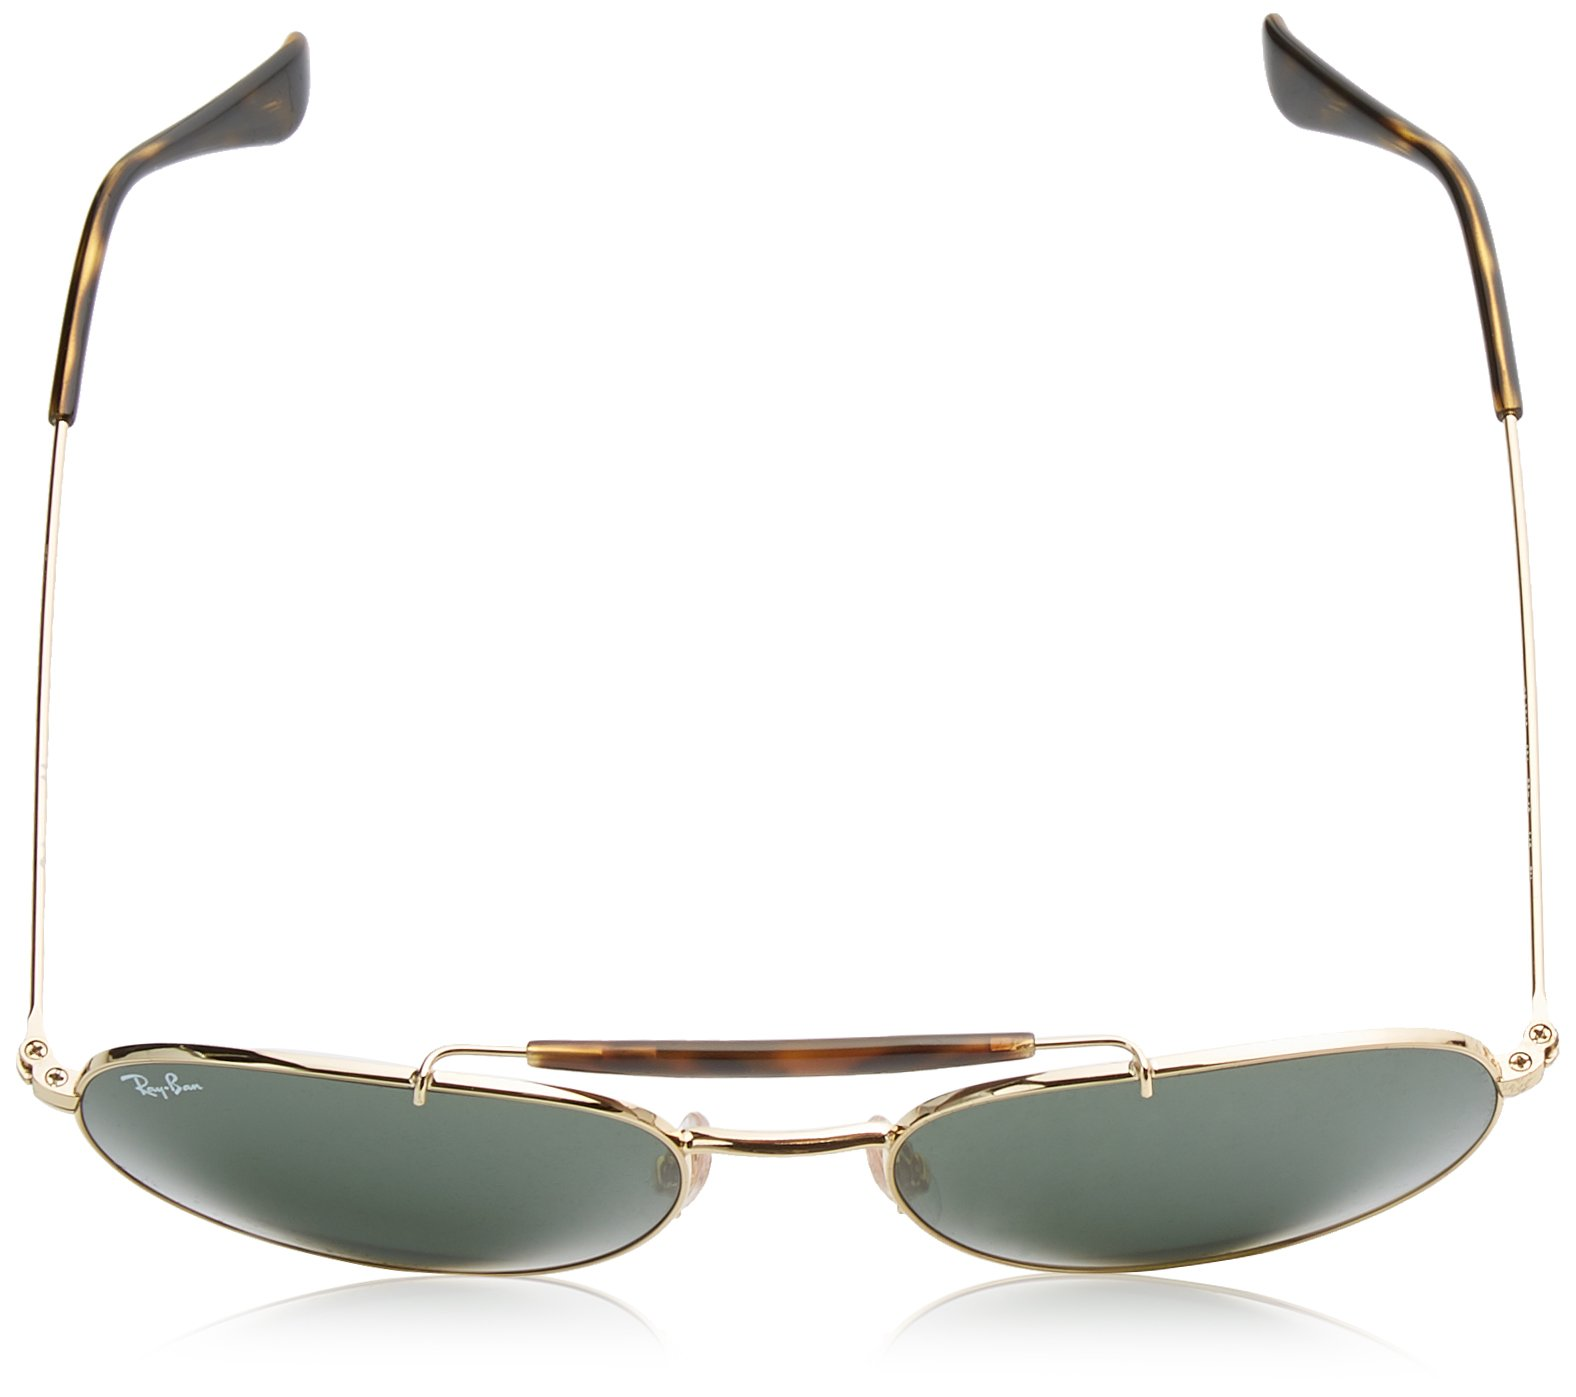 e2f1c6868366 Ray-Ban RB3016 Classic Clubmaster Sunglasses - Giftsandwish